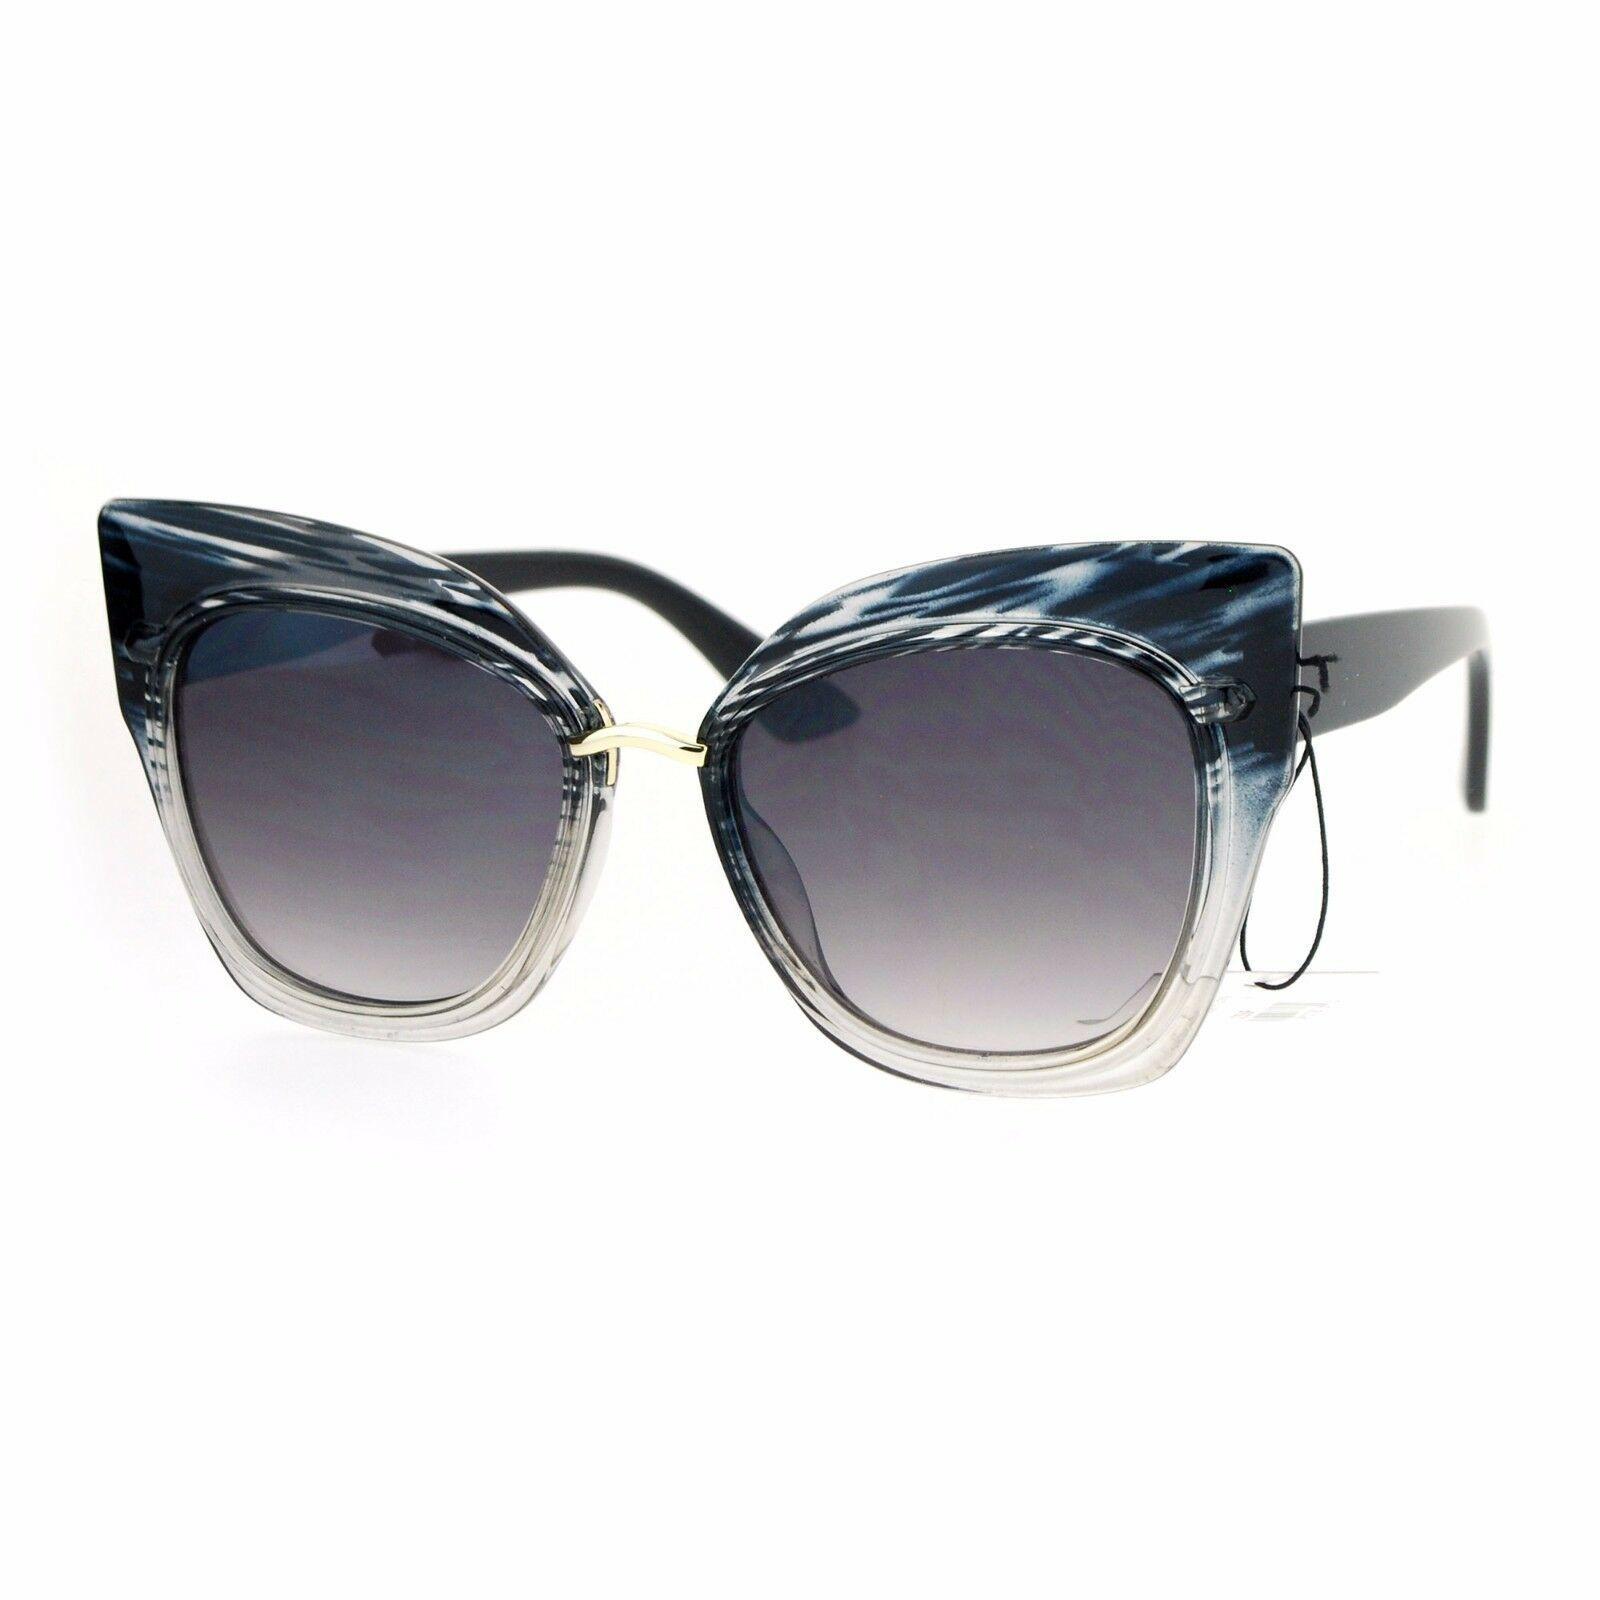 Oversized Fashion Sunglasses Womens Square Cateye Butterfly UV 400